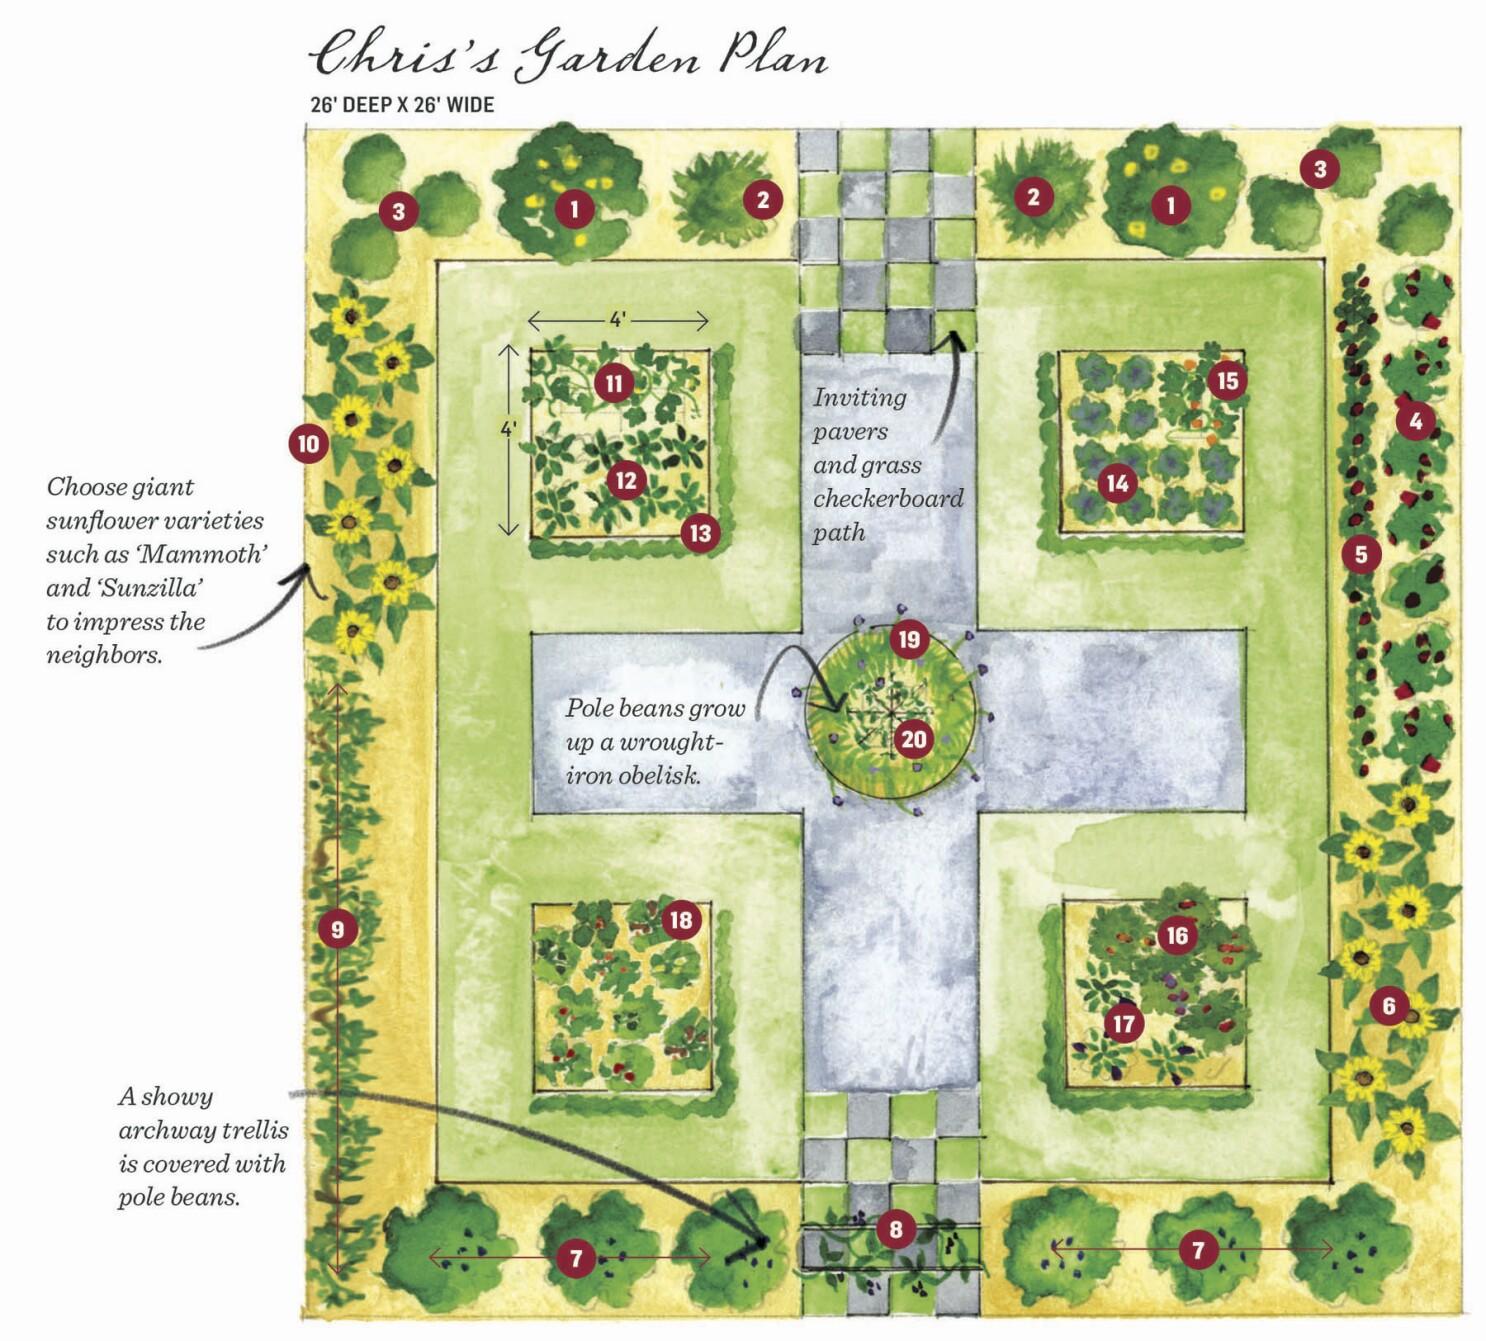 Groundbreaking Food Gardens Presents 73 Themed Plans Los